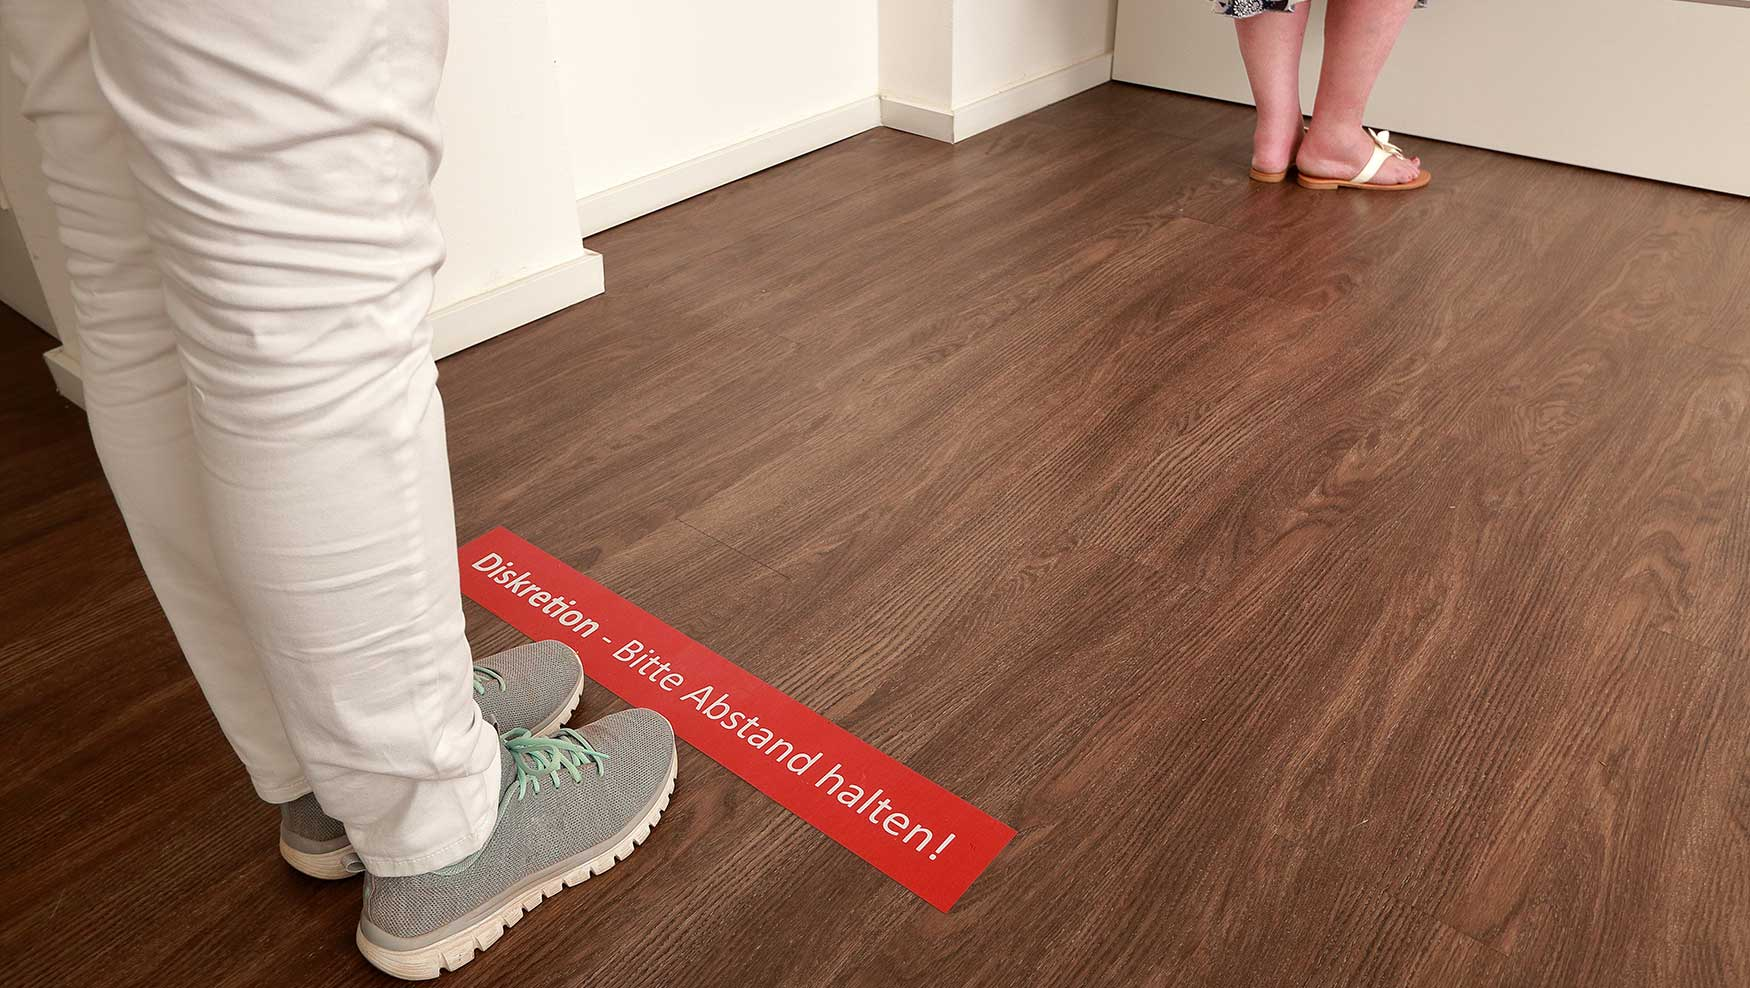 floorgraphics_social_distancing_4